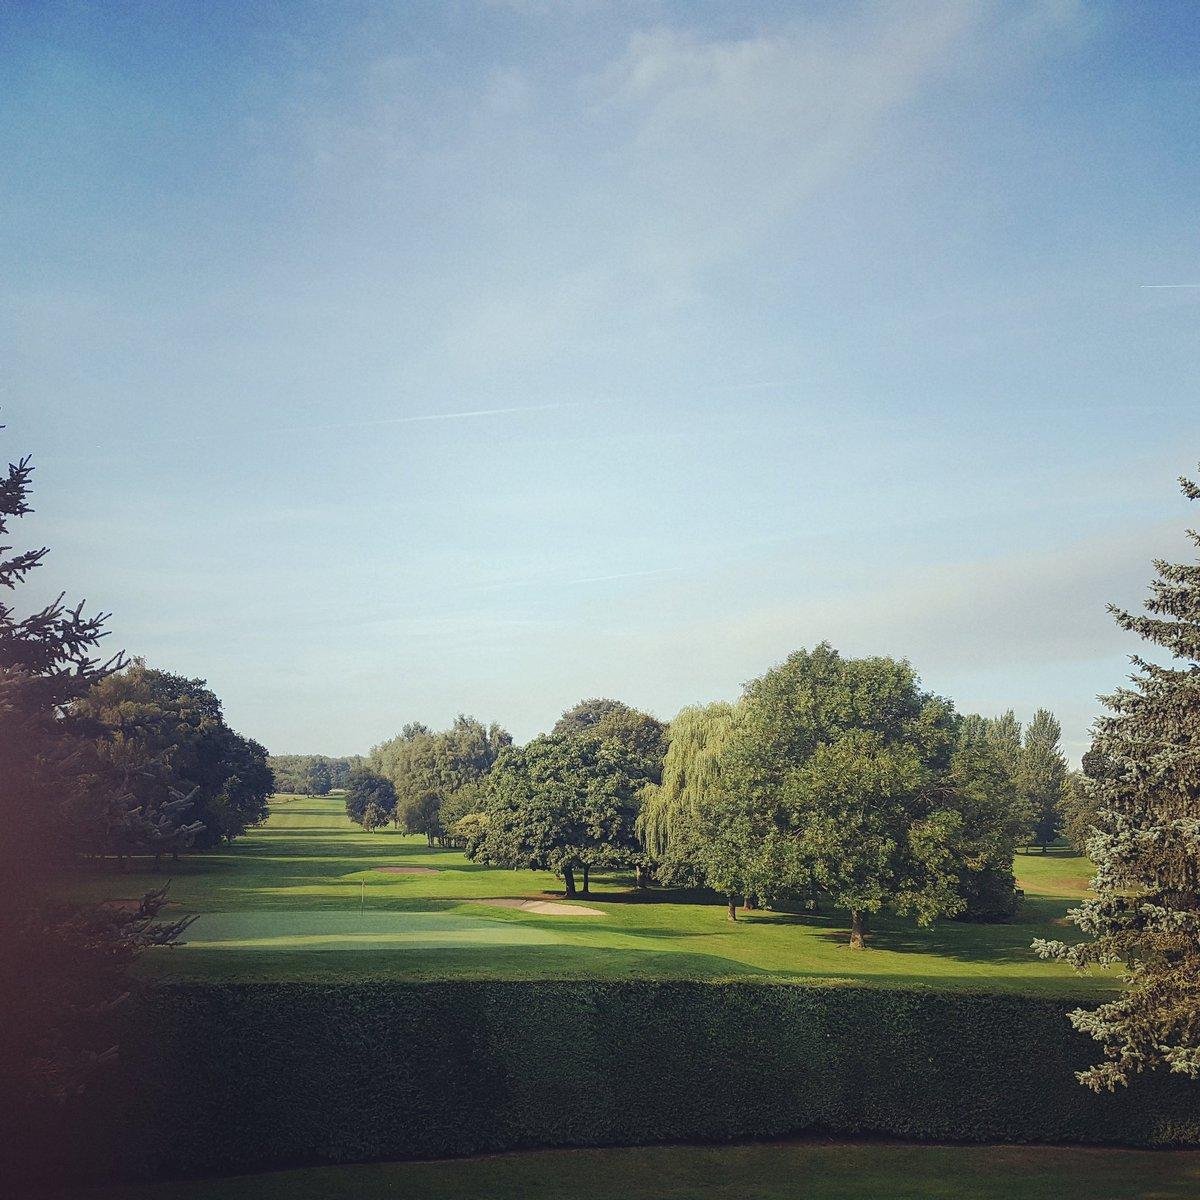 test Twitter Media - Morning!...  Another beautiful day at @ingestreparkgolf! 'Twighlight' greenfees available between 4.30pm - 6.30pm #golf #morning #sunrise #timefor9 #expressgolf #welovegolf   @MidlandsGolfer @staffsgolf @ChaseGrammar @PerrysButcher @IPGCourseupdate @IanDaviesEEEgol https://t.co/3JQhqF5psh